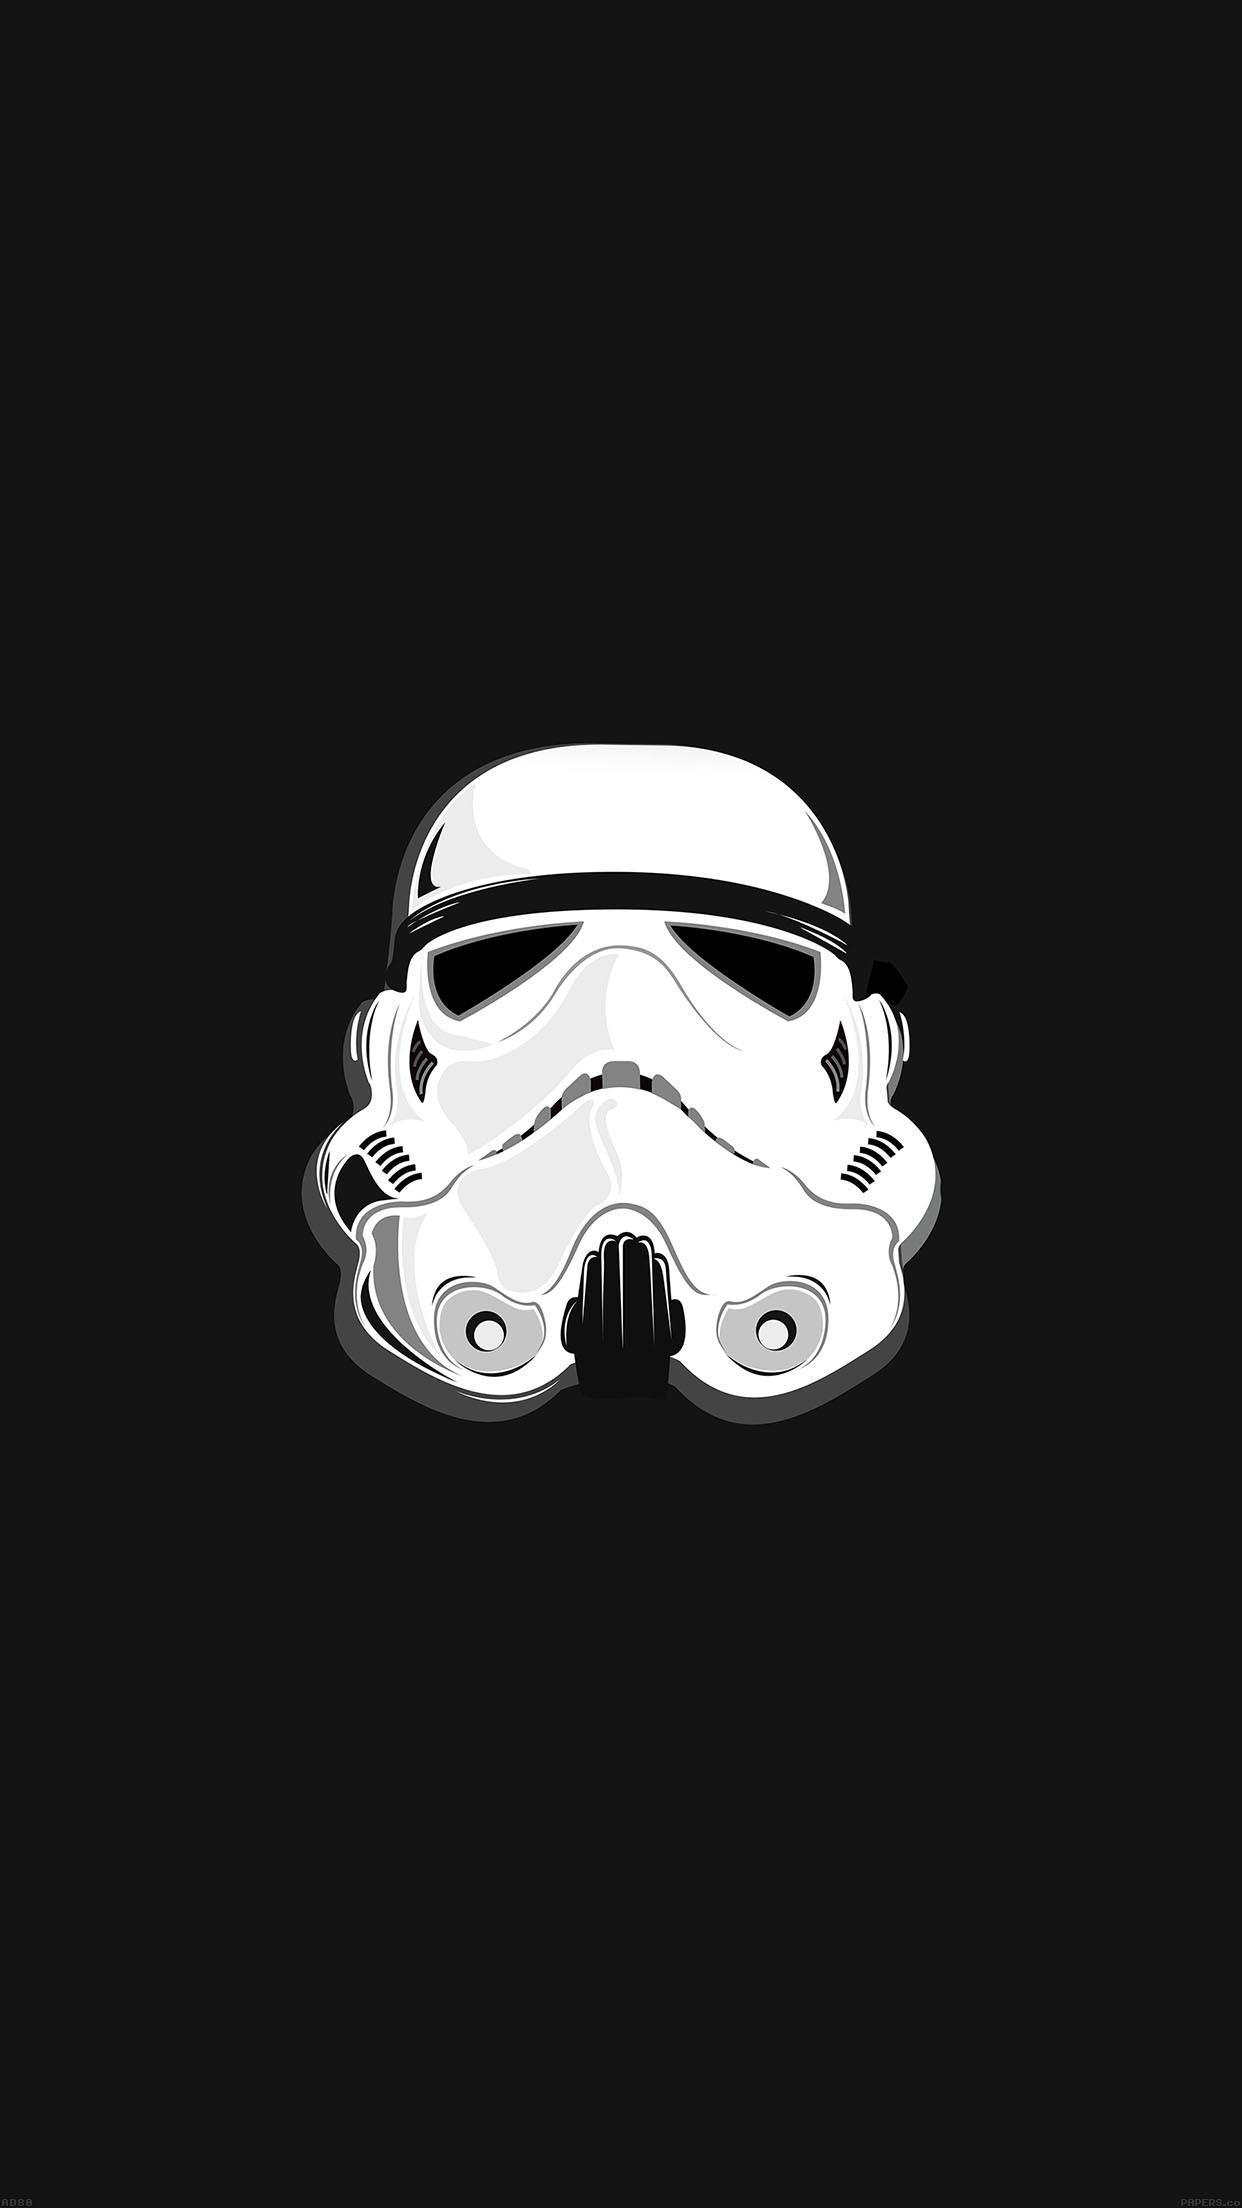 Download Star Wars Stormtrooper Illustration iPhone 6 Plus HD Wallpaper